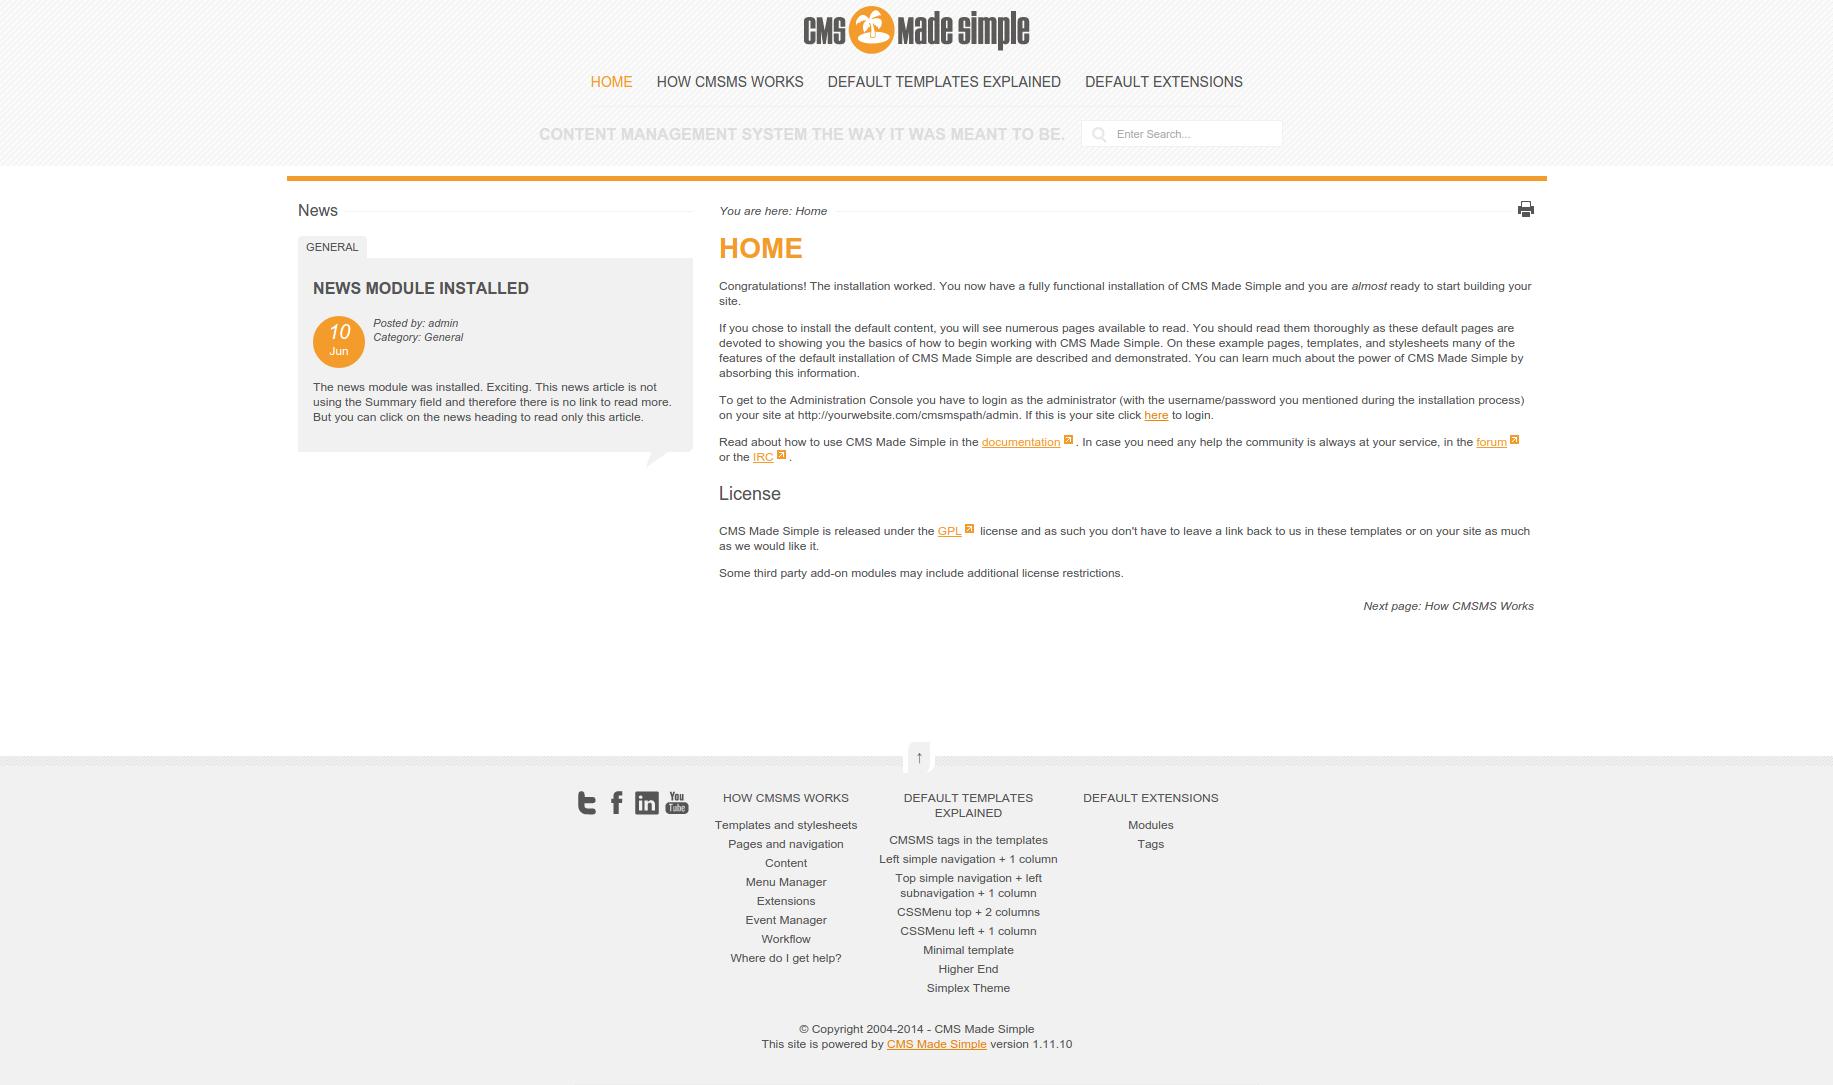 Screenshot of Davelandia CMSMS template home page